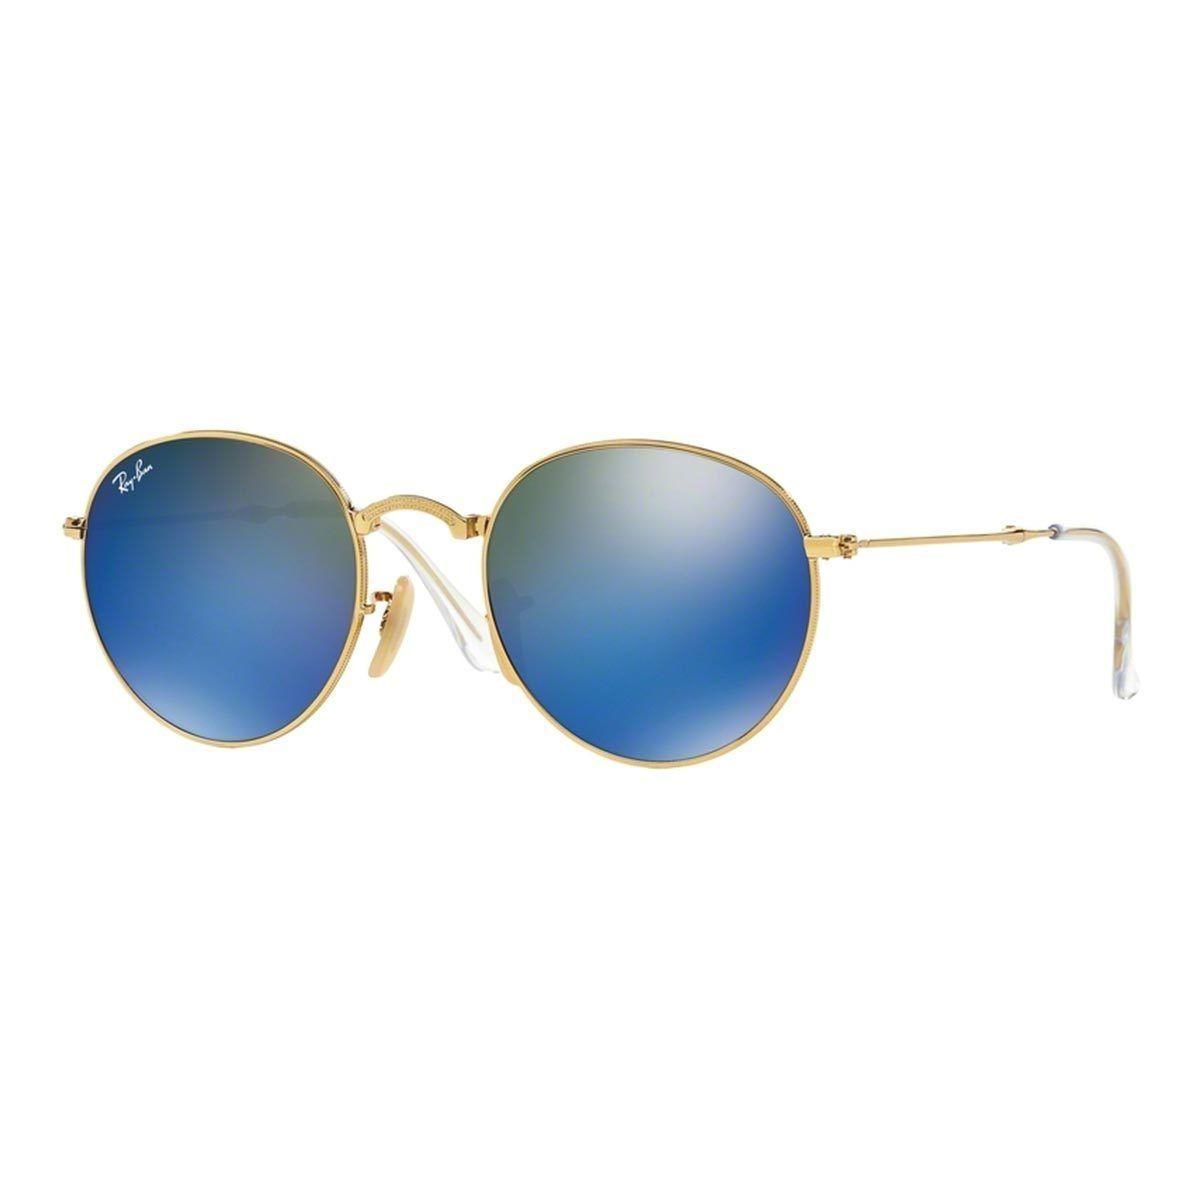 e5c25b39d0b Ray-Ban RB3532 001 68 Round Folding Frame Blue Mirror 50mm Lens Sunglasses